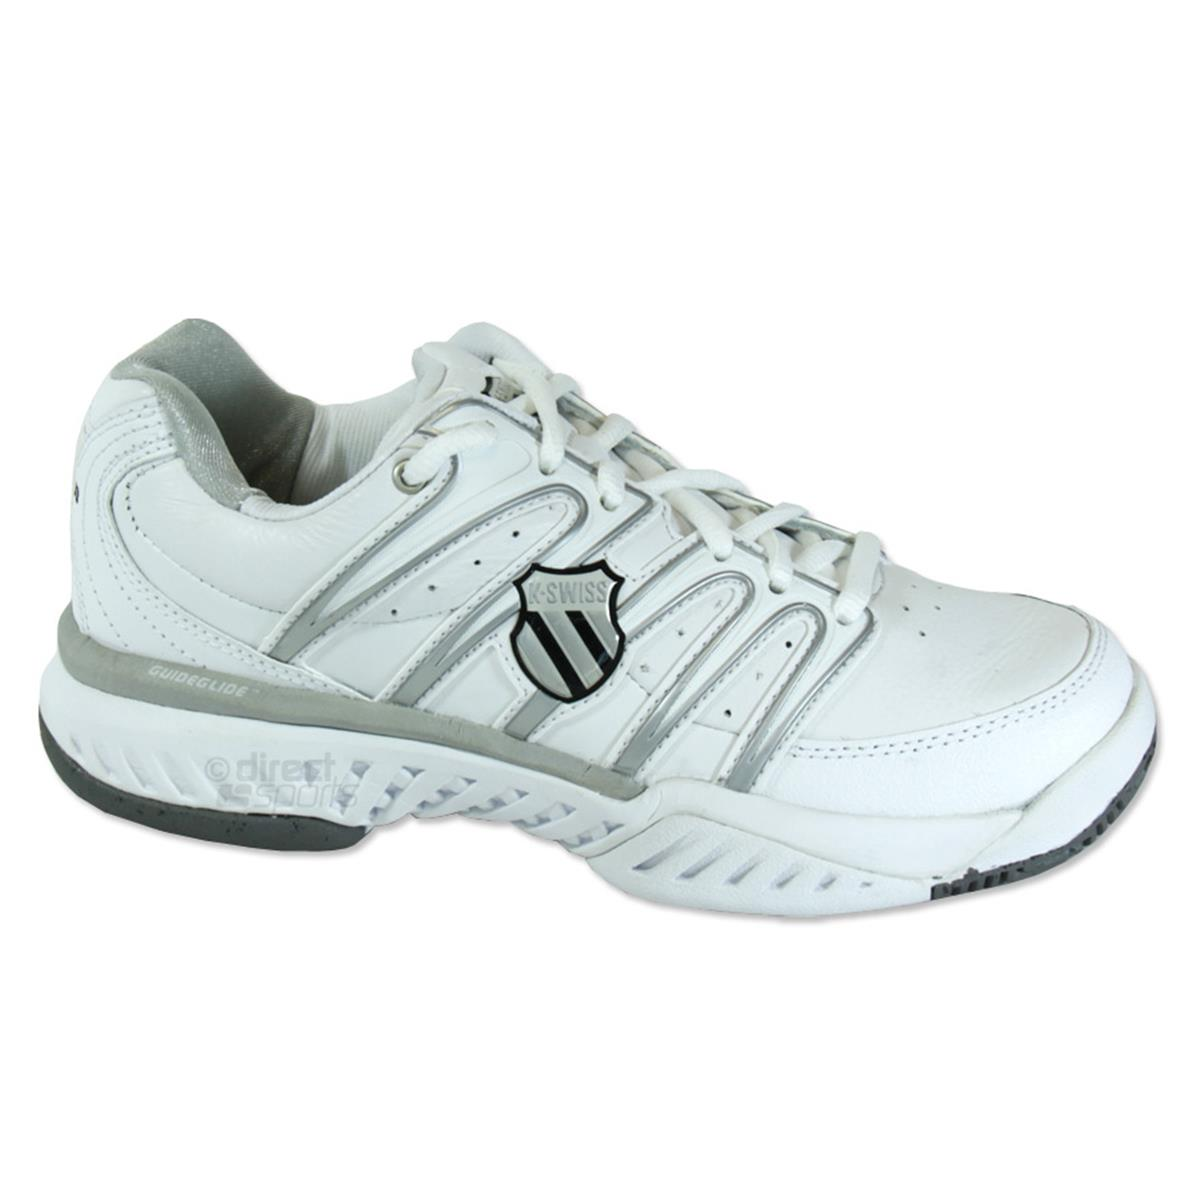 K Swiss Womens Tennis Shoes White Sil